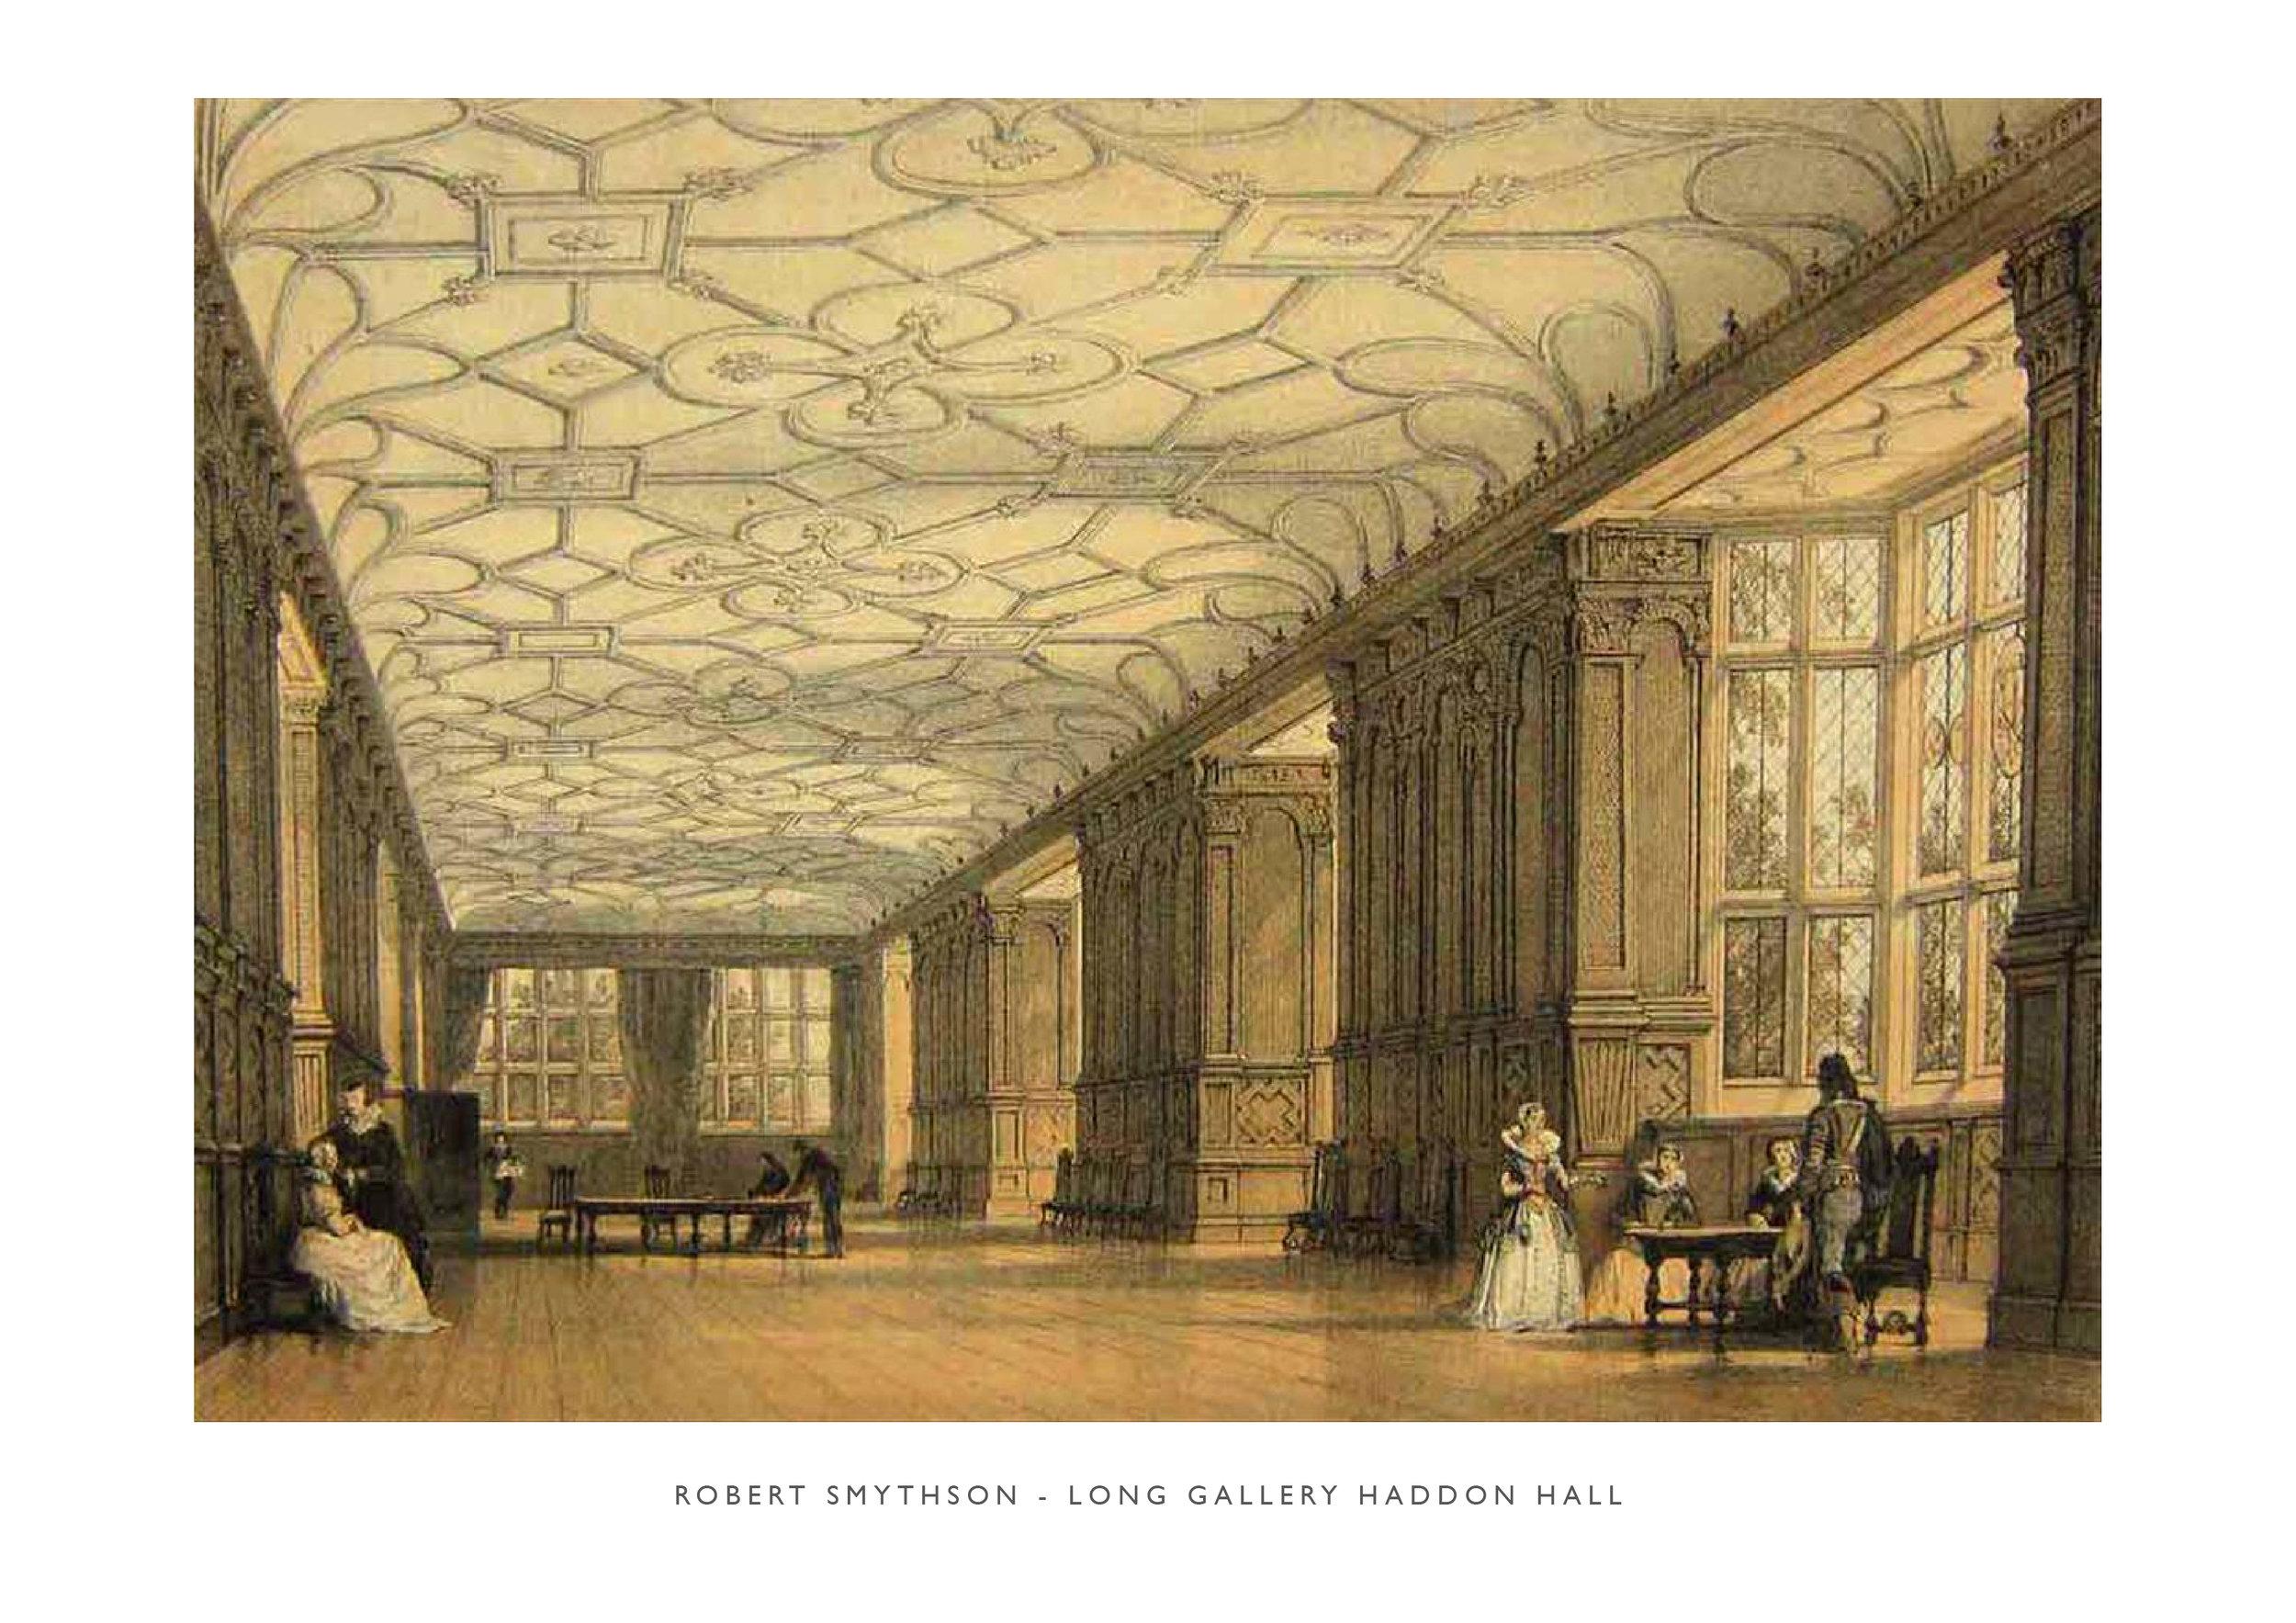 Smythson - Haddon Hall (Slide 5 from MWA Workshop at Courtauld)